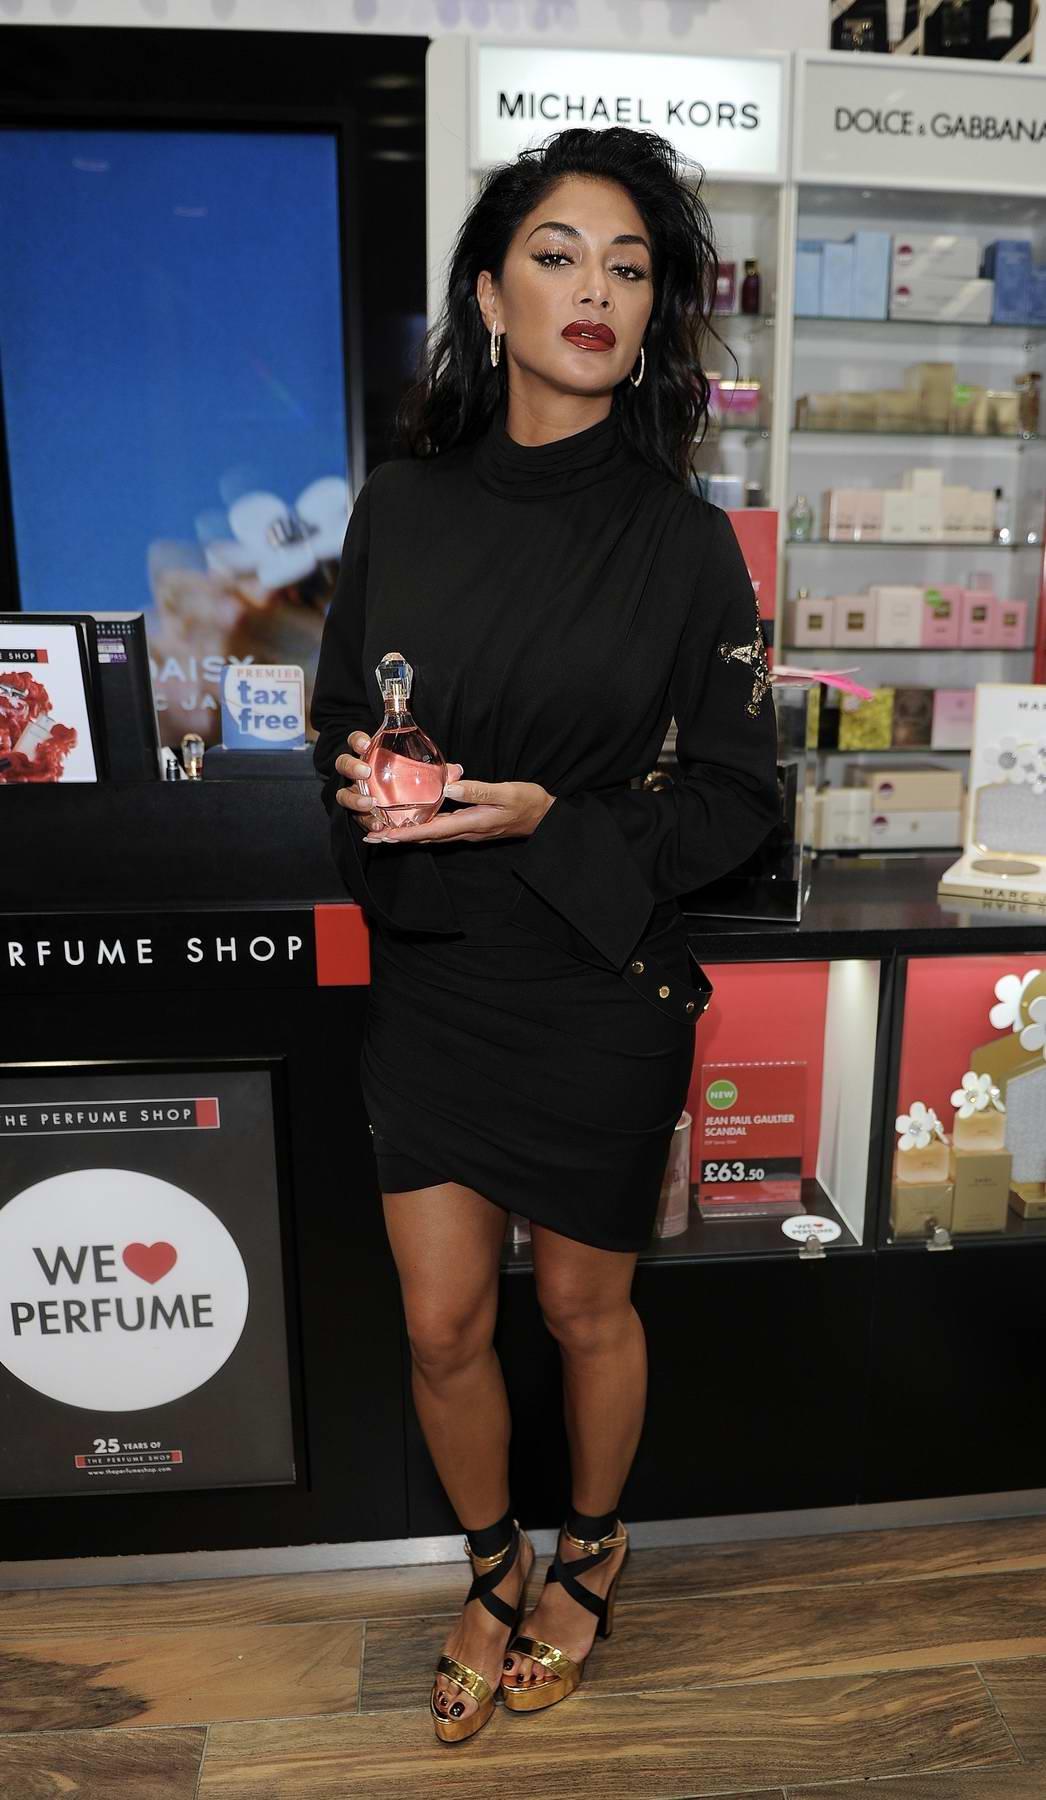 Nicole Scherzinger promoting her perfume CHOSEN in Birmingham, UK